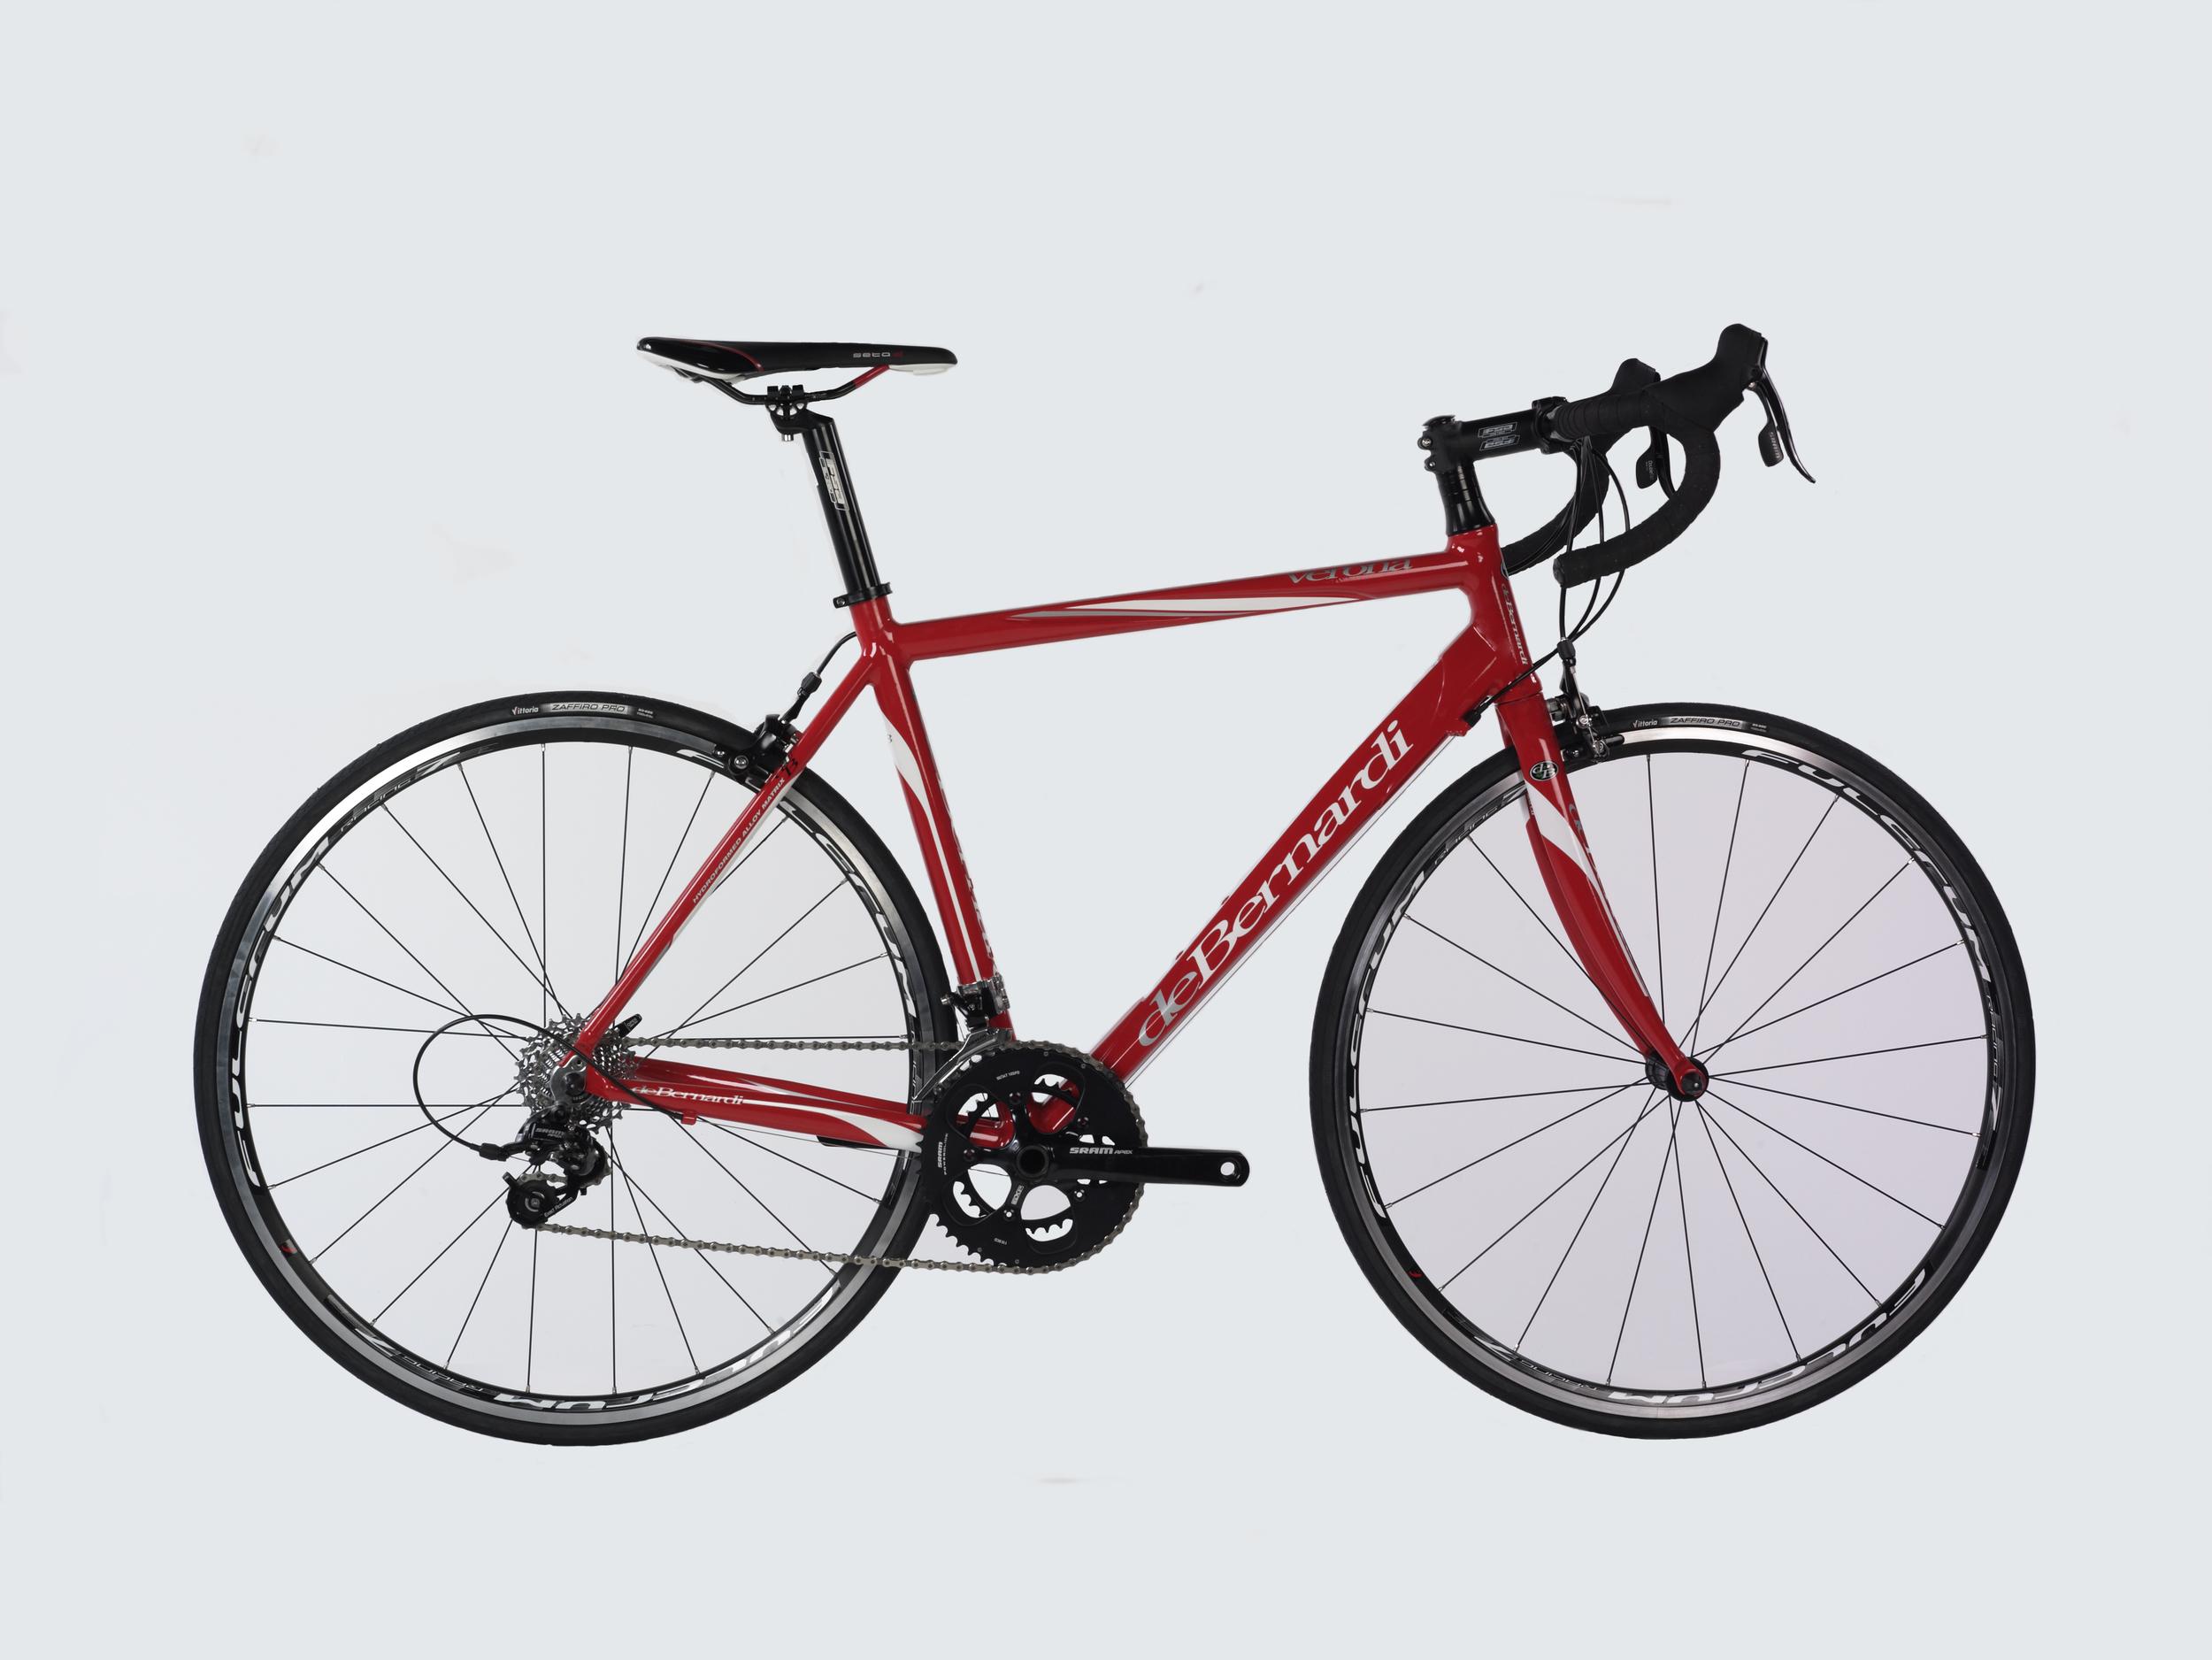 2014-09-22 Zar Intrnt'nl Bikes and Frames0009107.jpg